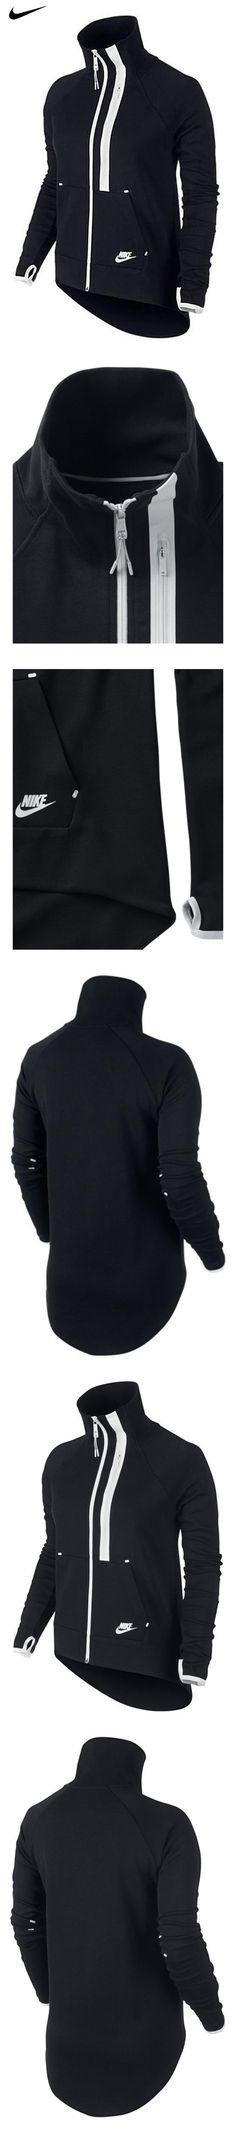 low priced 6132a b1c45 Amazon.com  Nike Tech Fleece Moto Cape Black White 642688-010 Women s  Medium  Sports   Outdoors